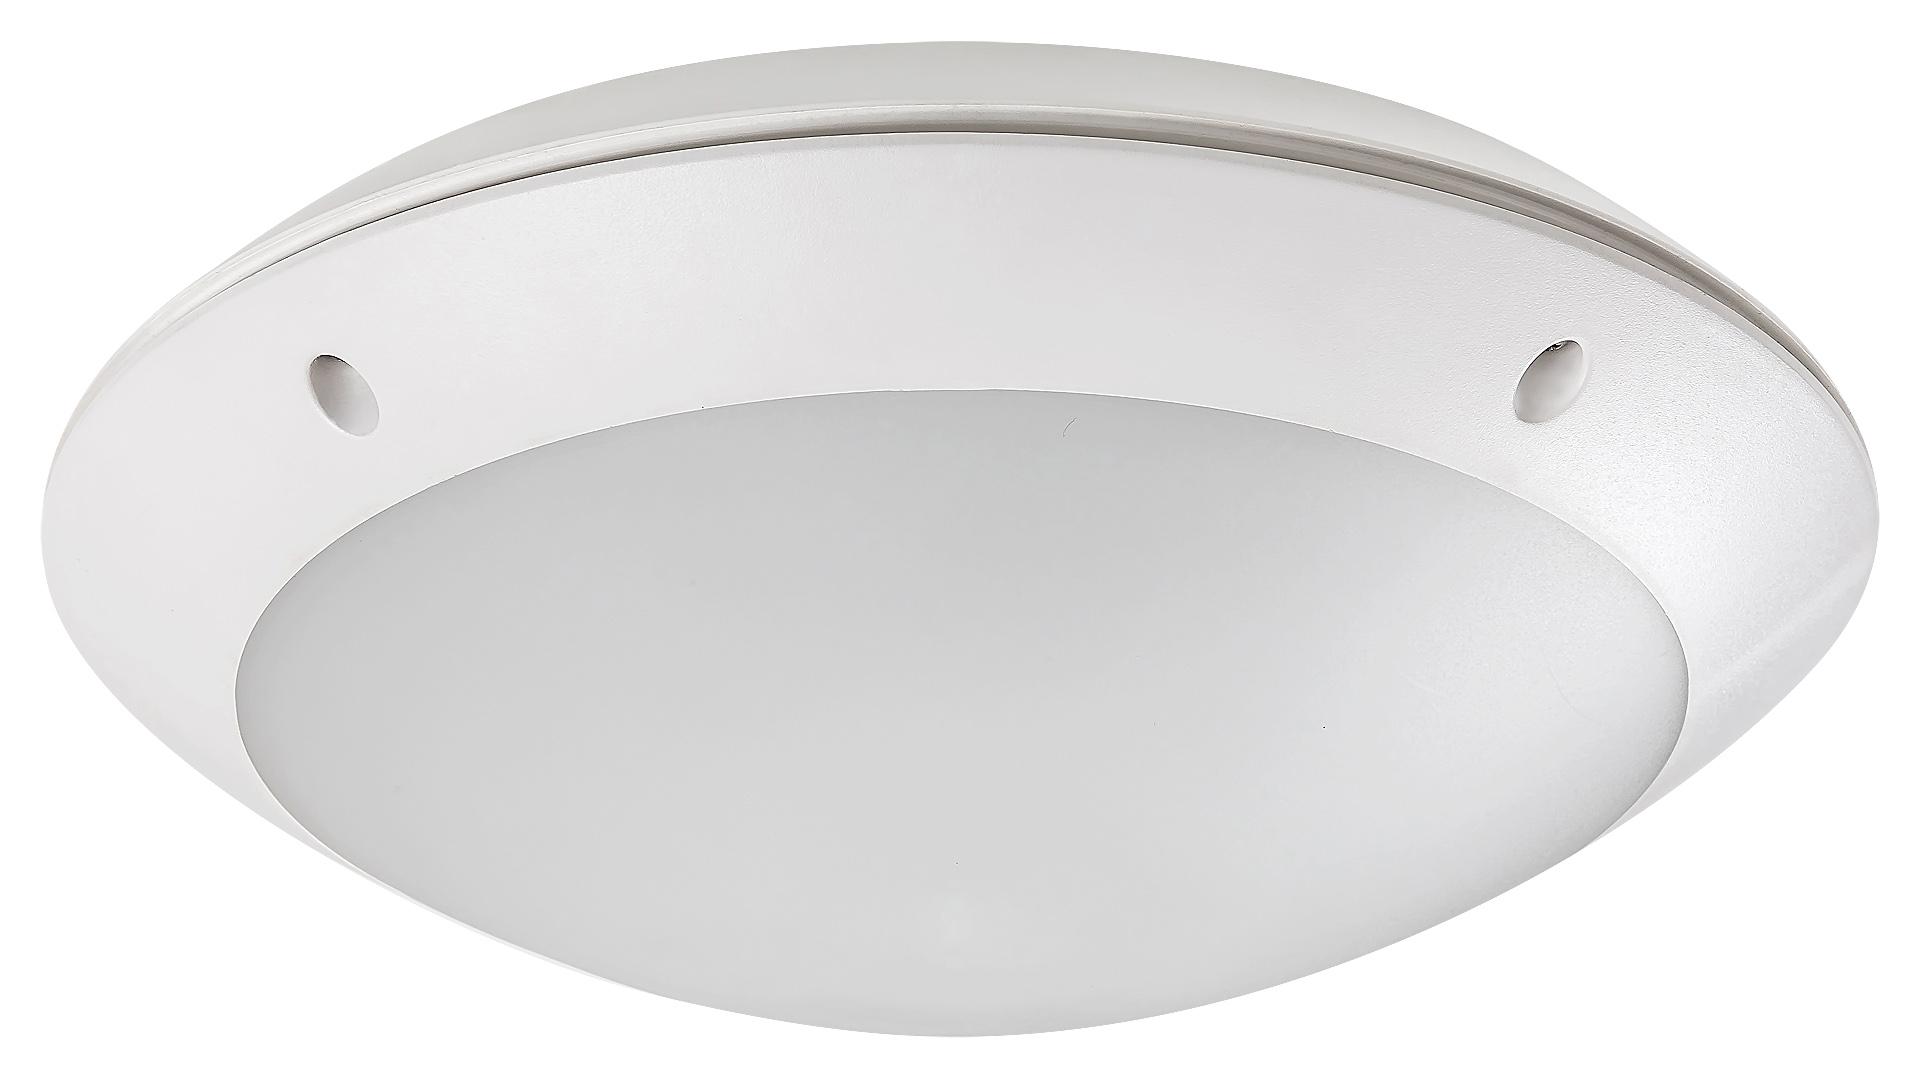 LED PLAFONJERA VANJSKA SA SENZOROM 12W 720Lm 4000K